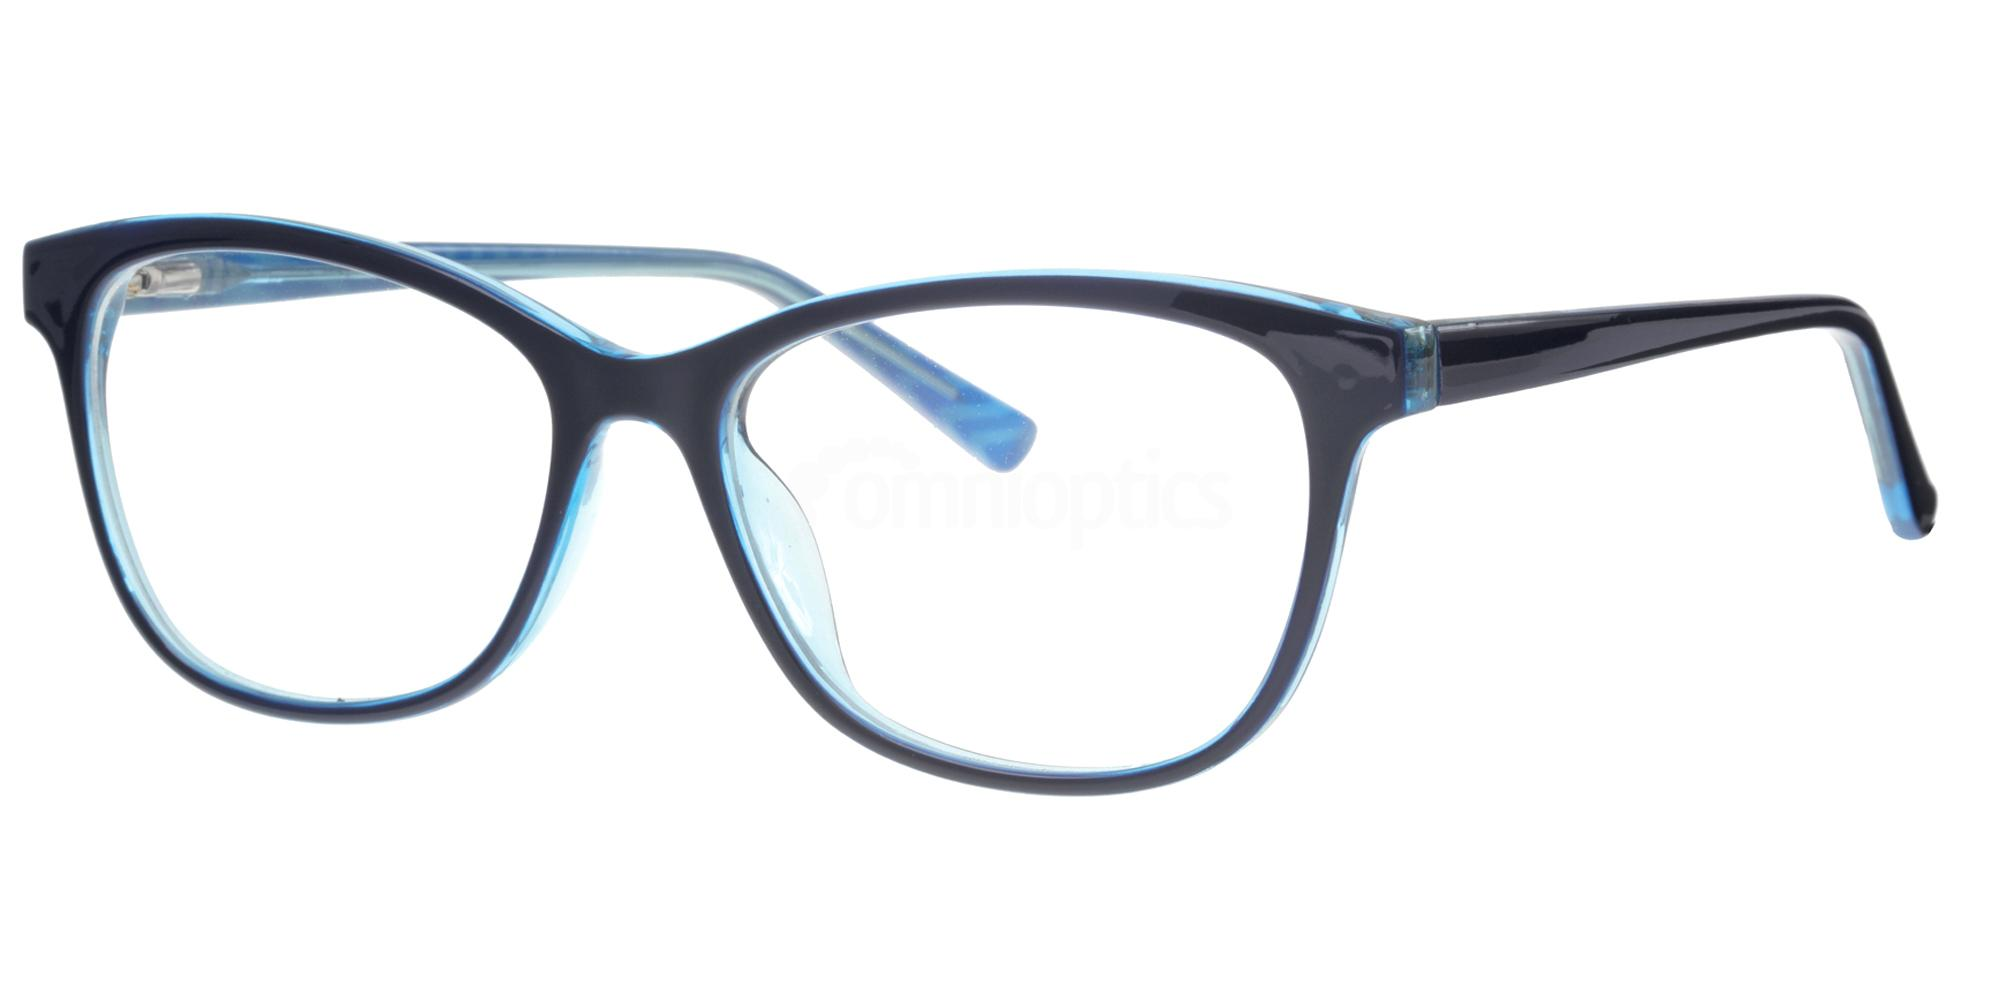 C40 4567 Glasses, Visage